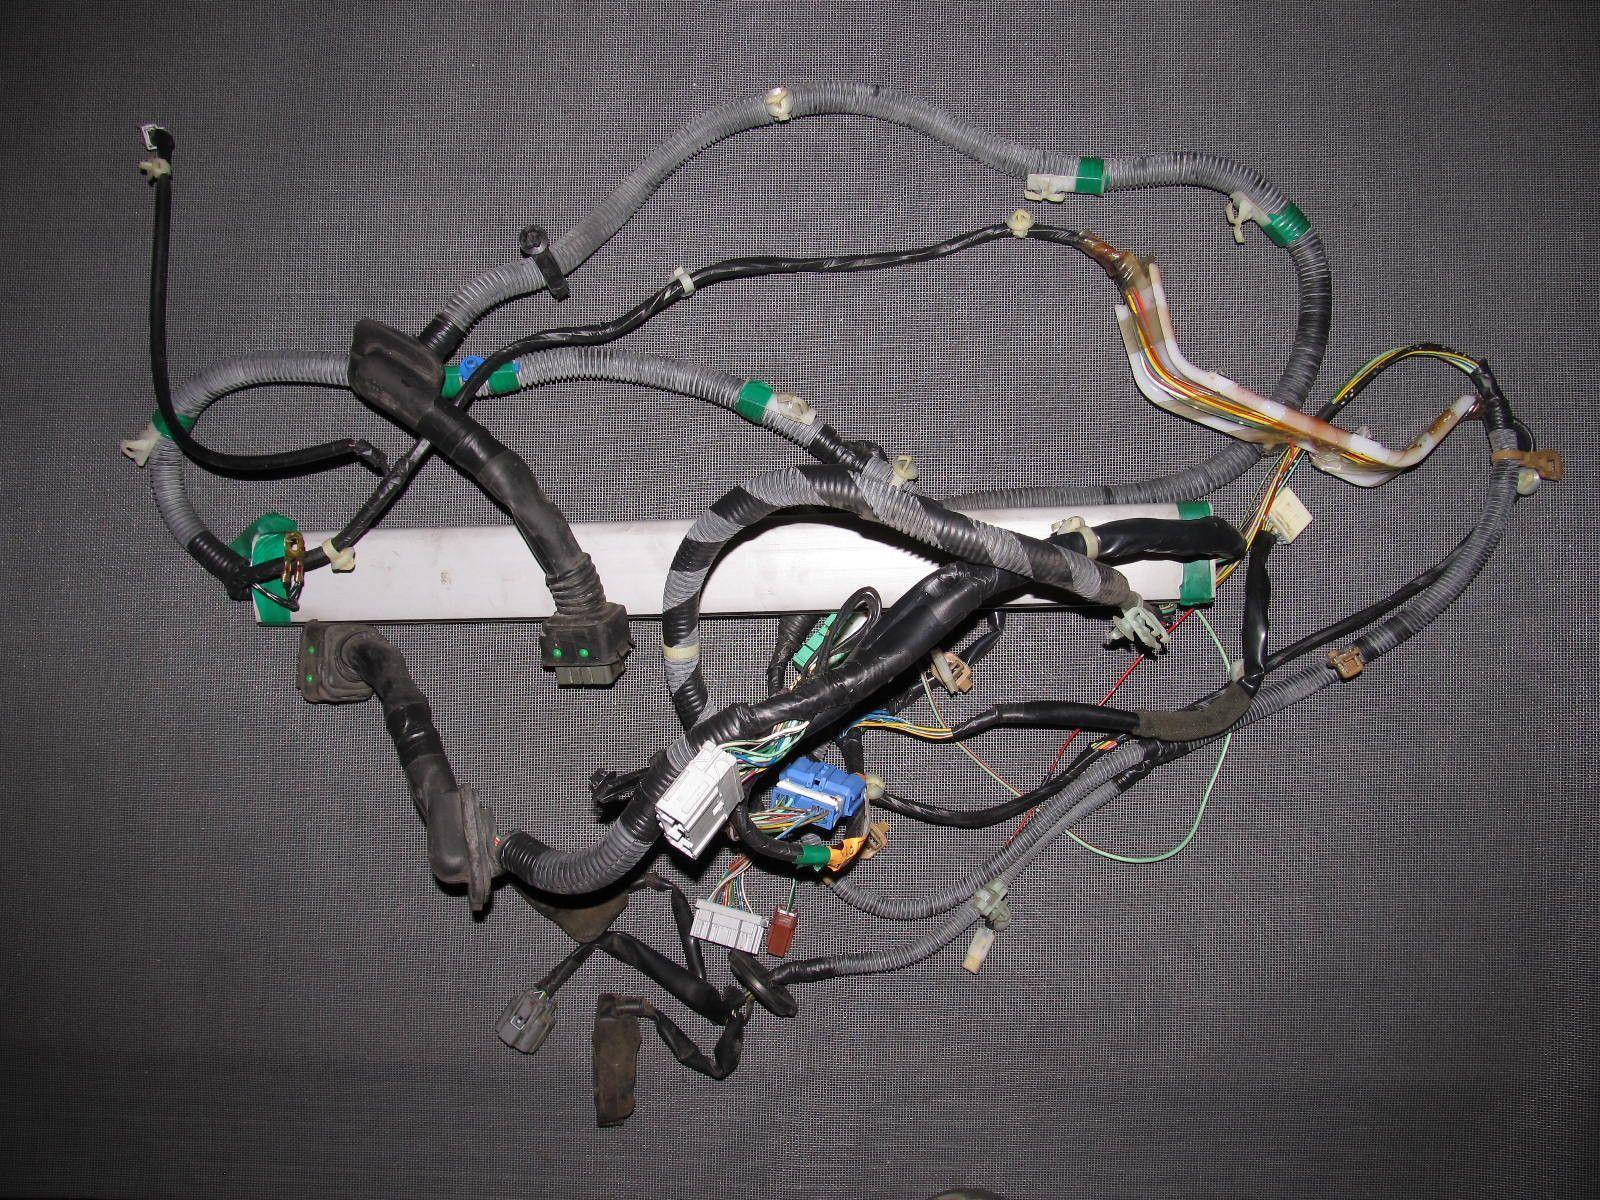 96 97 98 honda civic oem chassis door wiring harness [ 1600 x 1200 Pixel ]